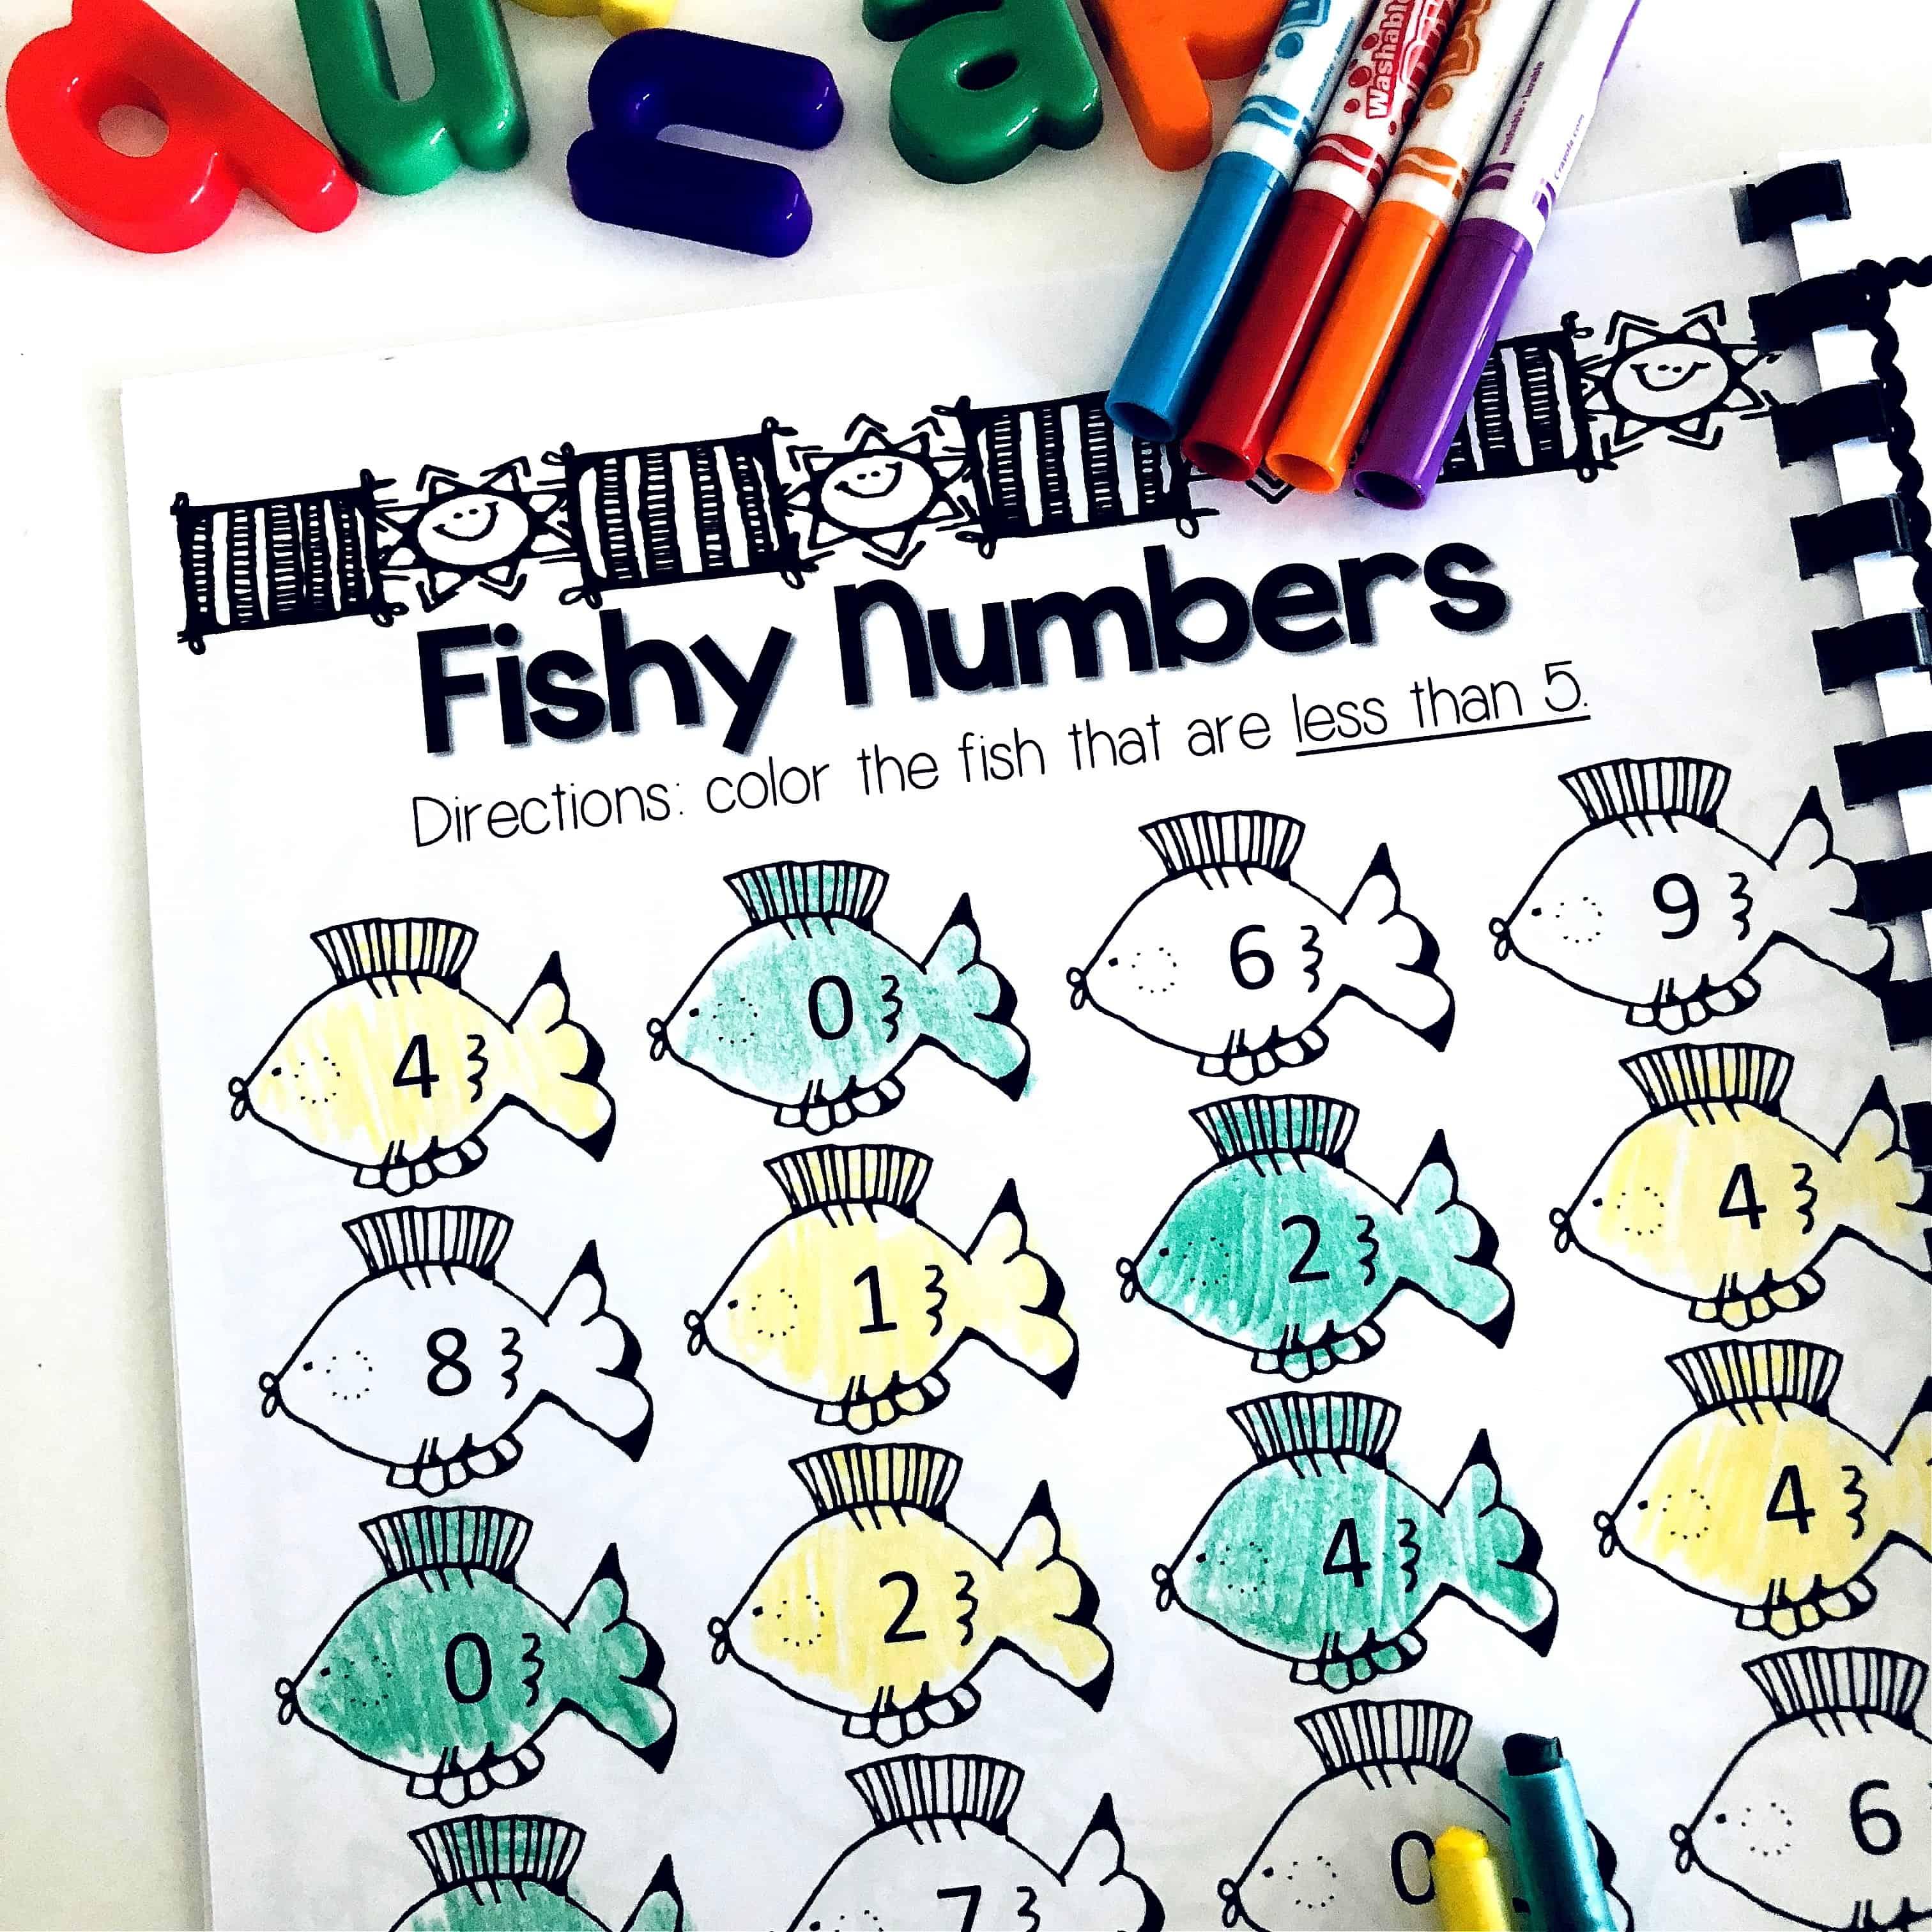 20 Handwriting Fun Print Practice Activities For Kids Who Hate Writing